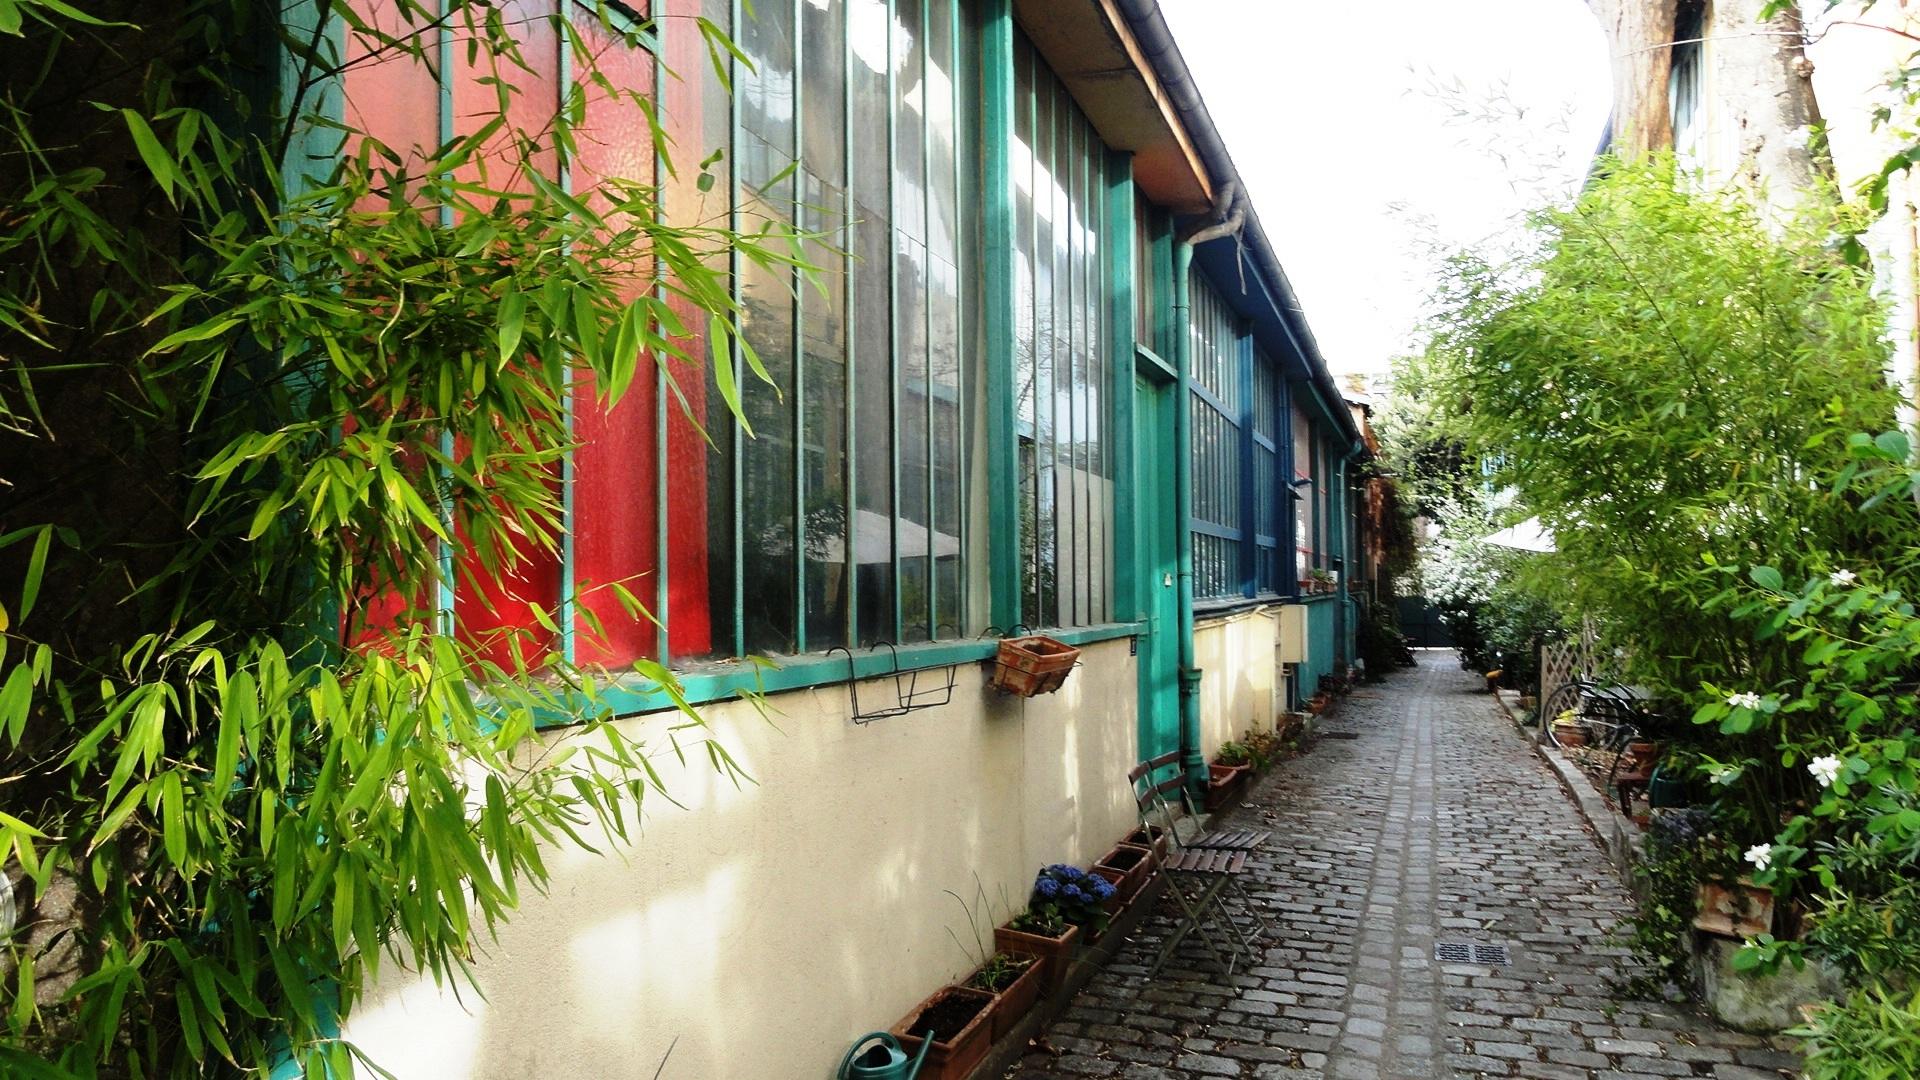 hd wallpapers maison du monde 13e